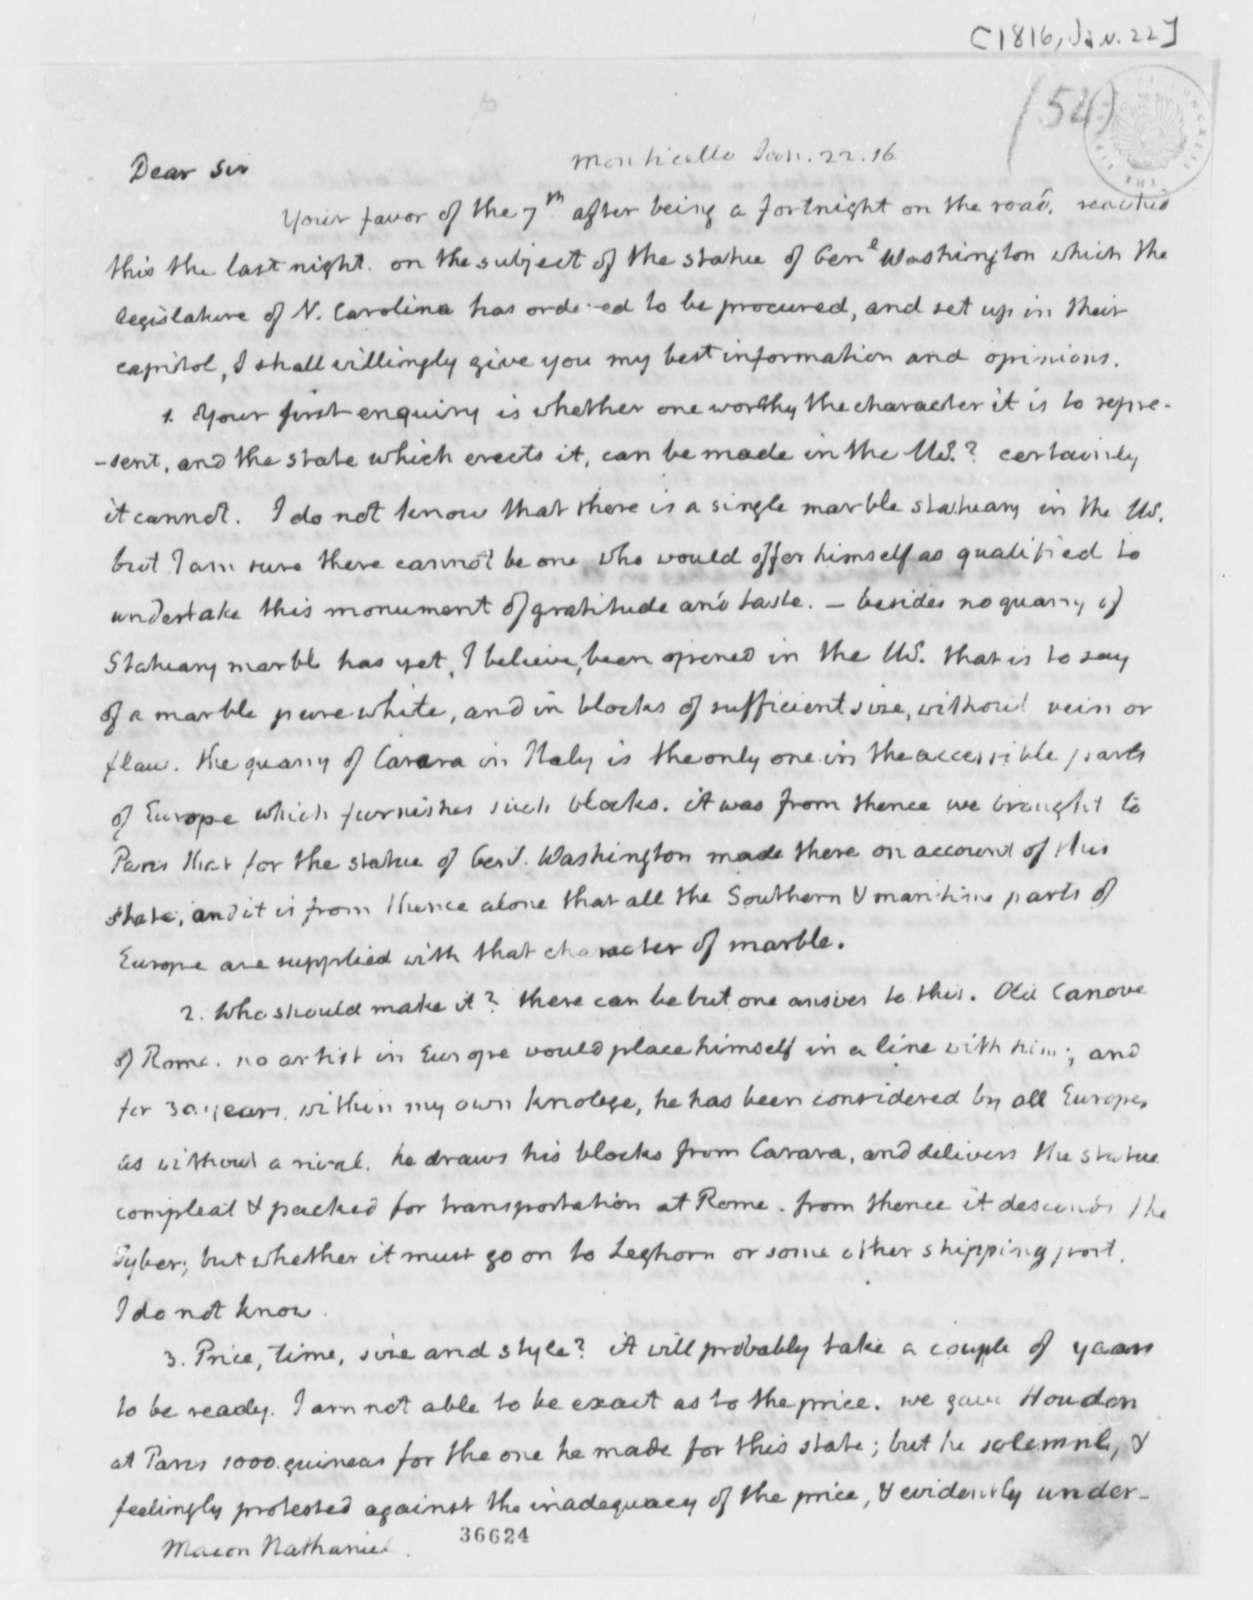 Thomas Jefferson to Nathaniel Macon, January 22, 1816